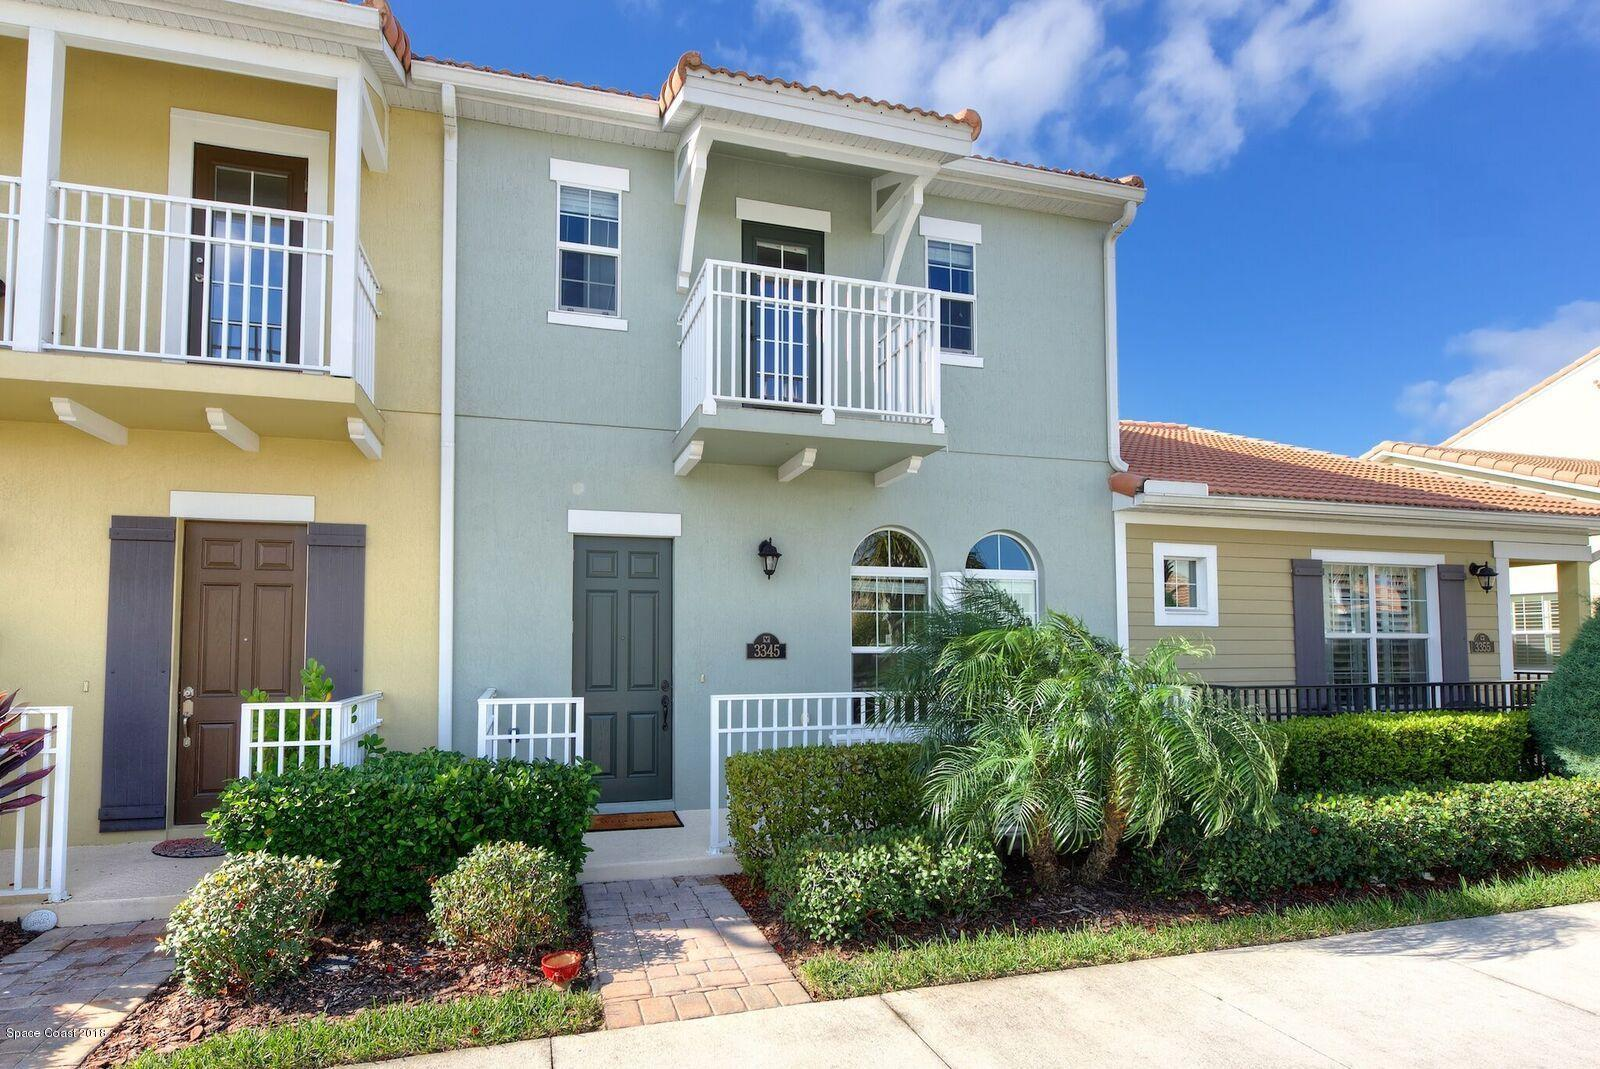 Property for Sale at 3345 Sedge 3345 Sedge Viera, Florida 32955 United States